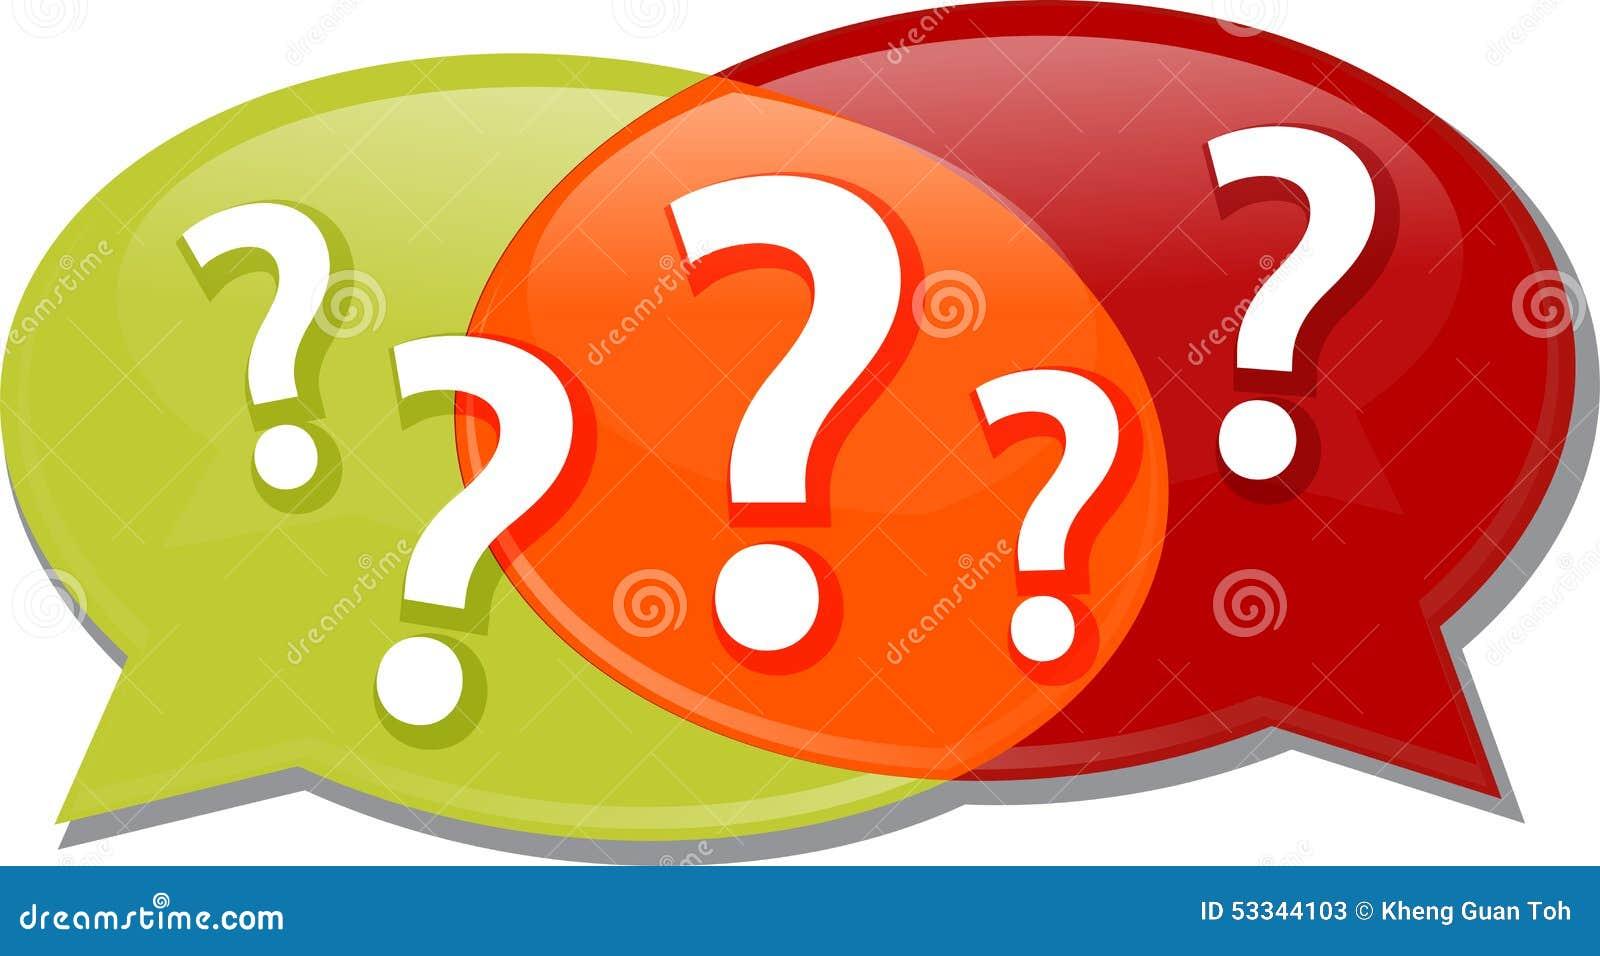 Questions Clipart Animation Questions dialog conversation